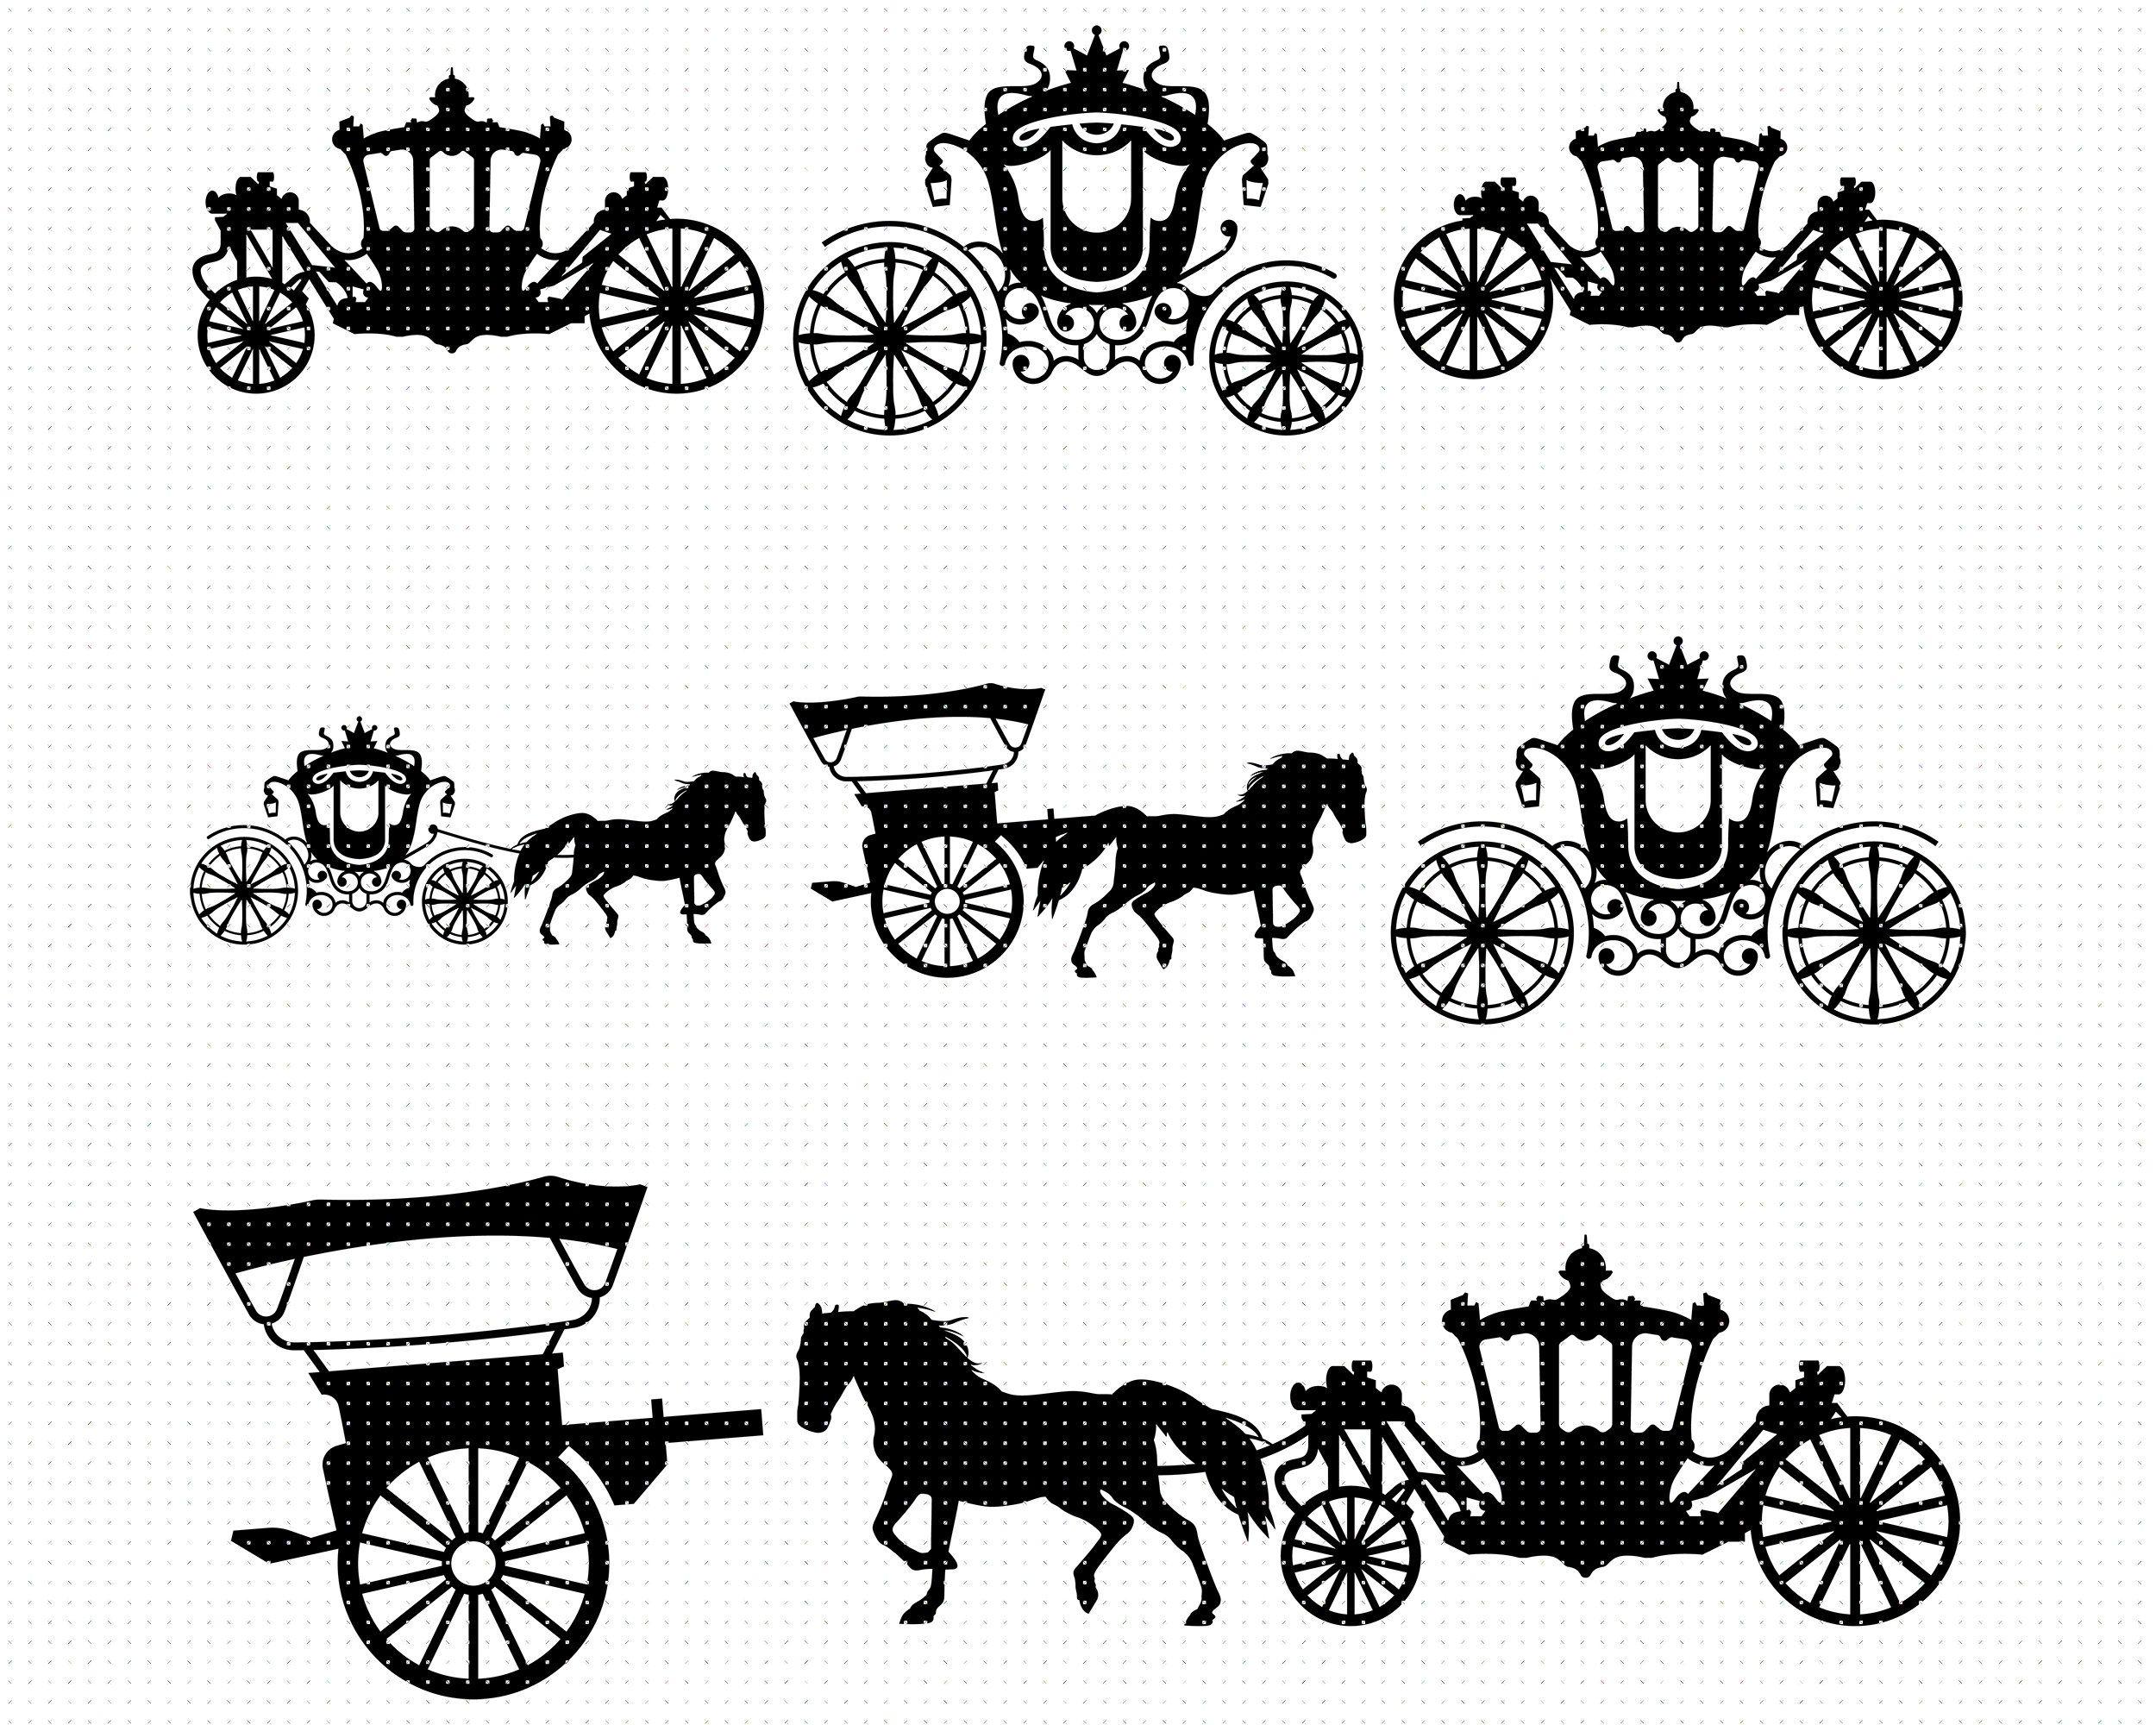 Horse Carriage Svg Princess Carriage Svg Horse Drawn Etsy Horse Carriage Princess Carriage Svg